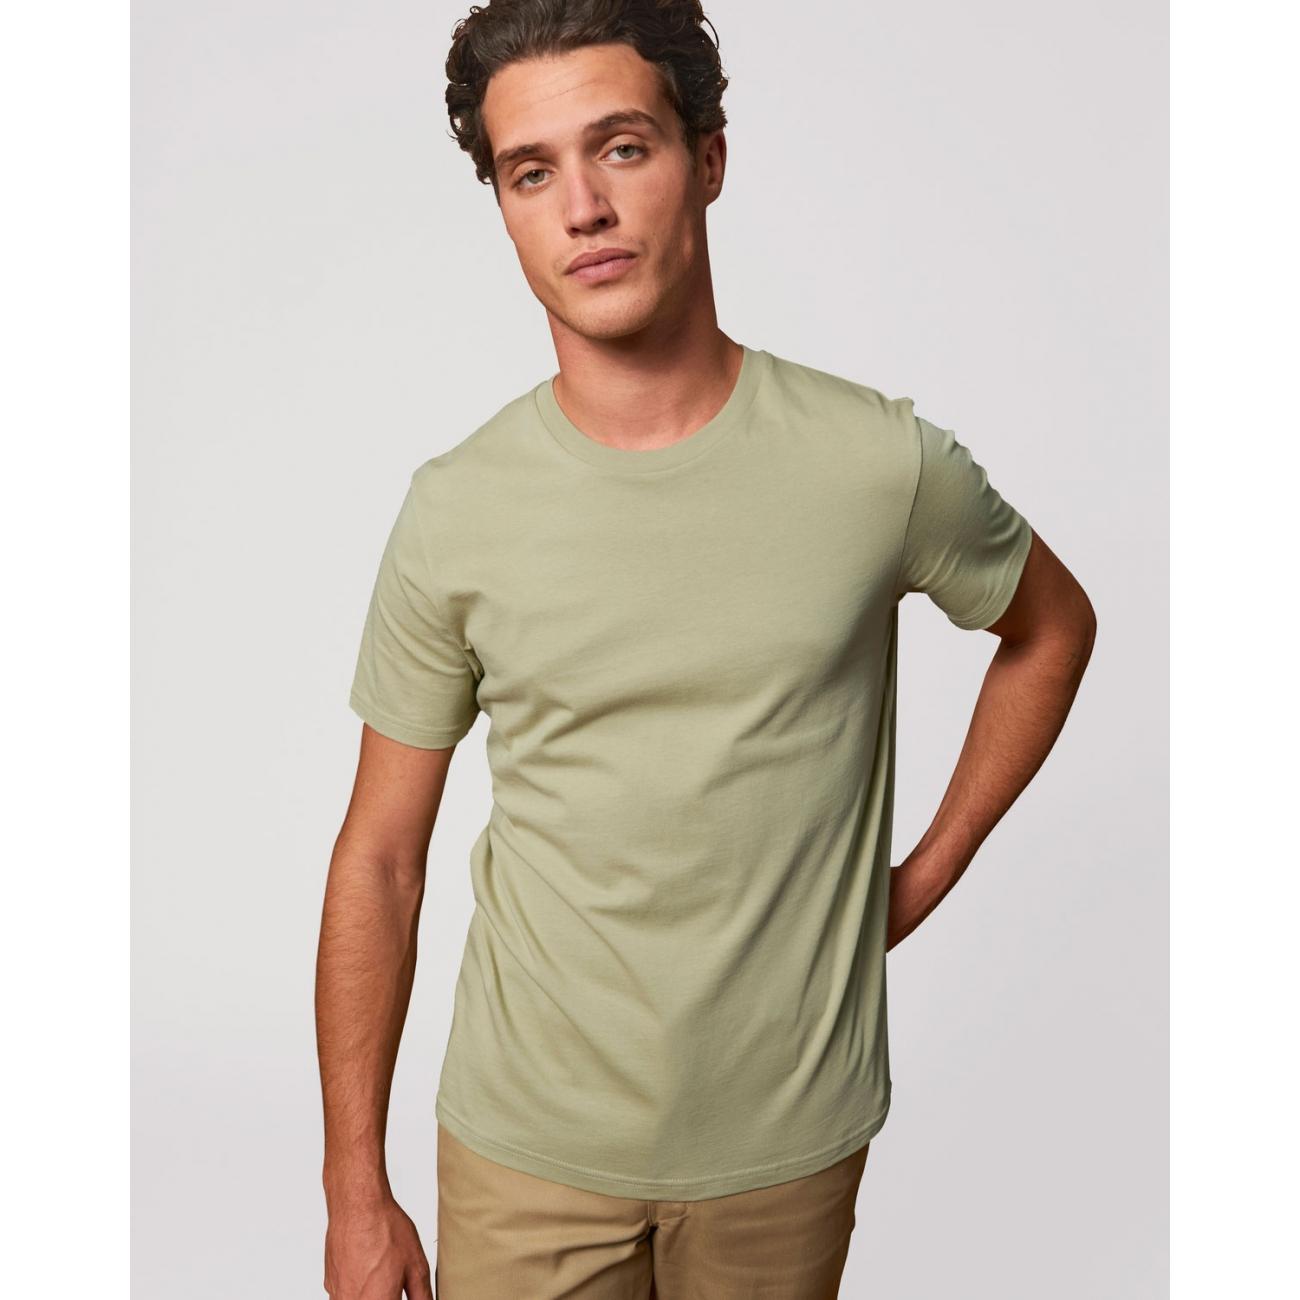 https://tee-shirt-bio.com/10290-thickbox_default/tee-shirt-homme-coton-bio-col-rond-coupe-classique-vert-sauge.jpg